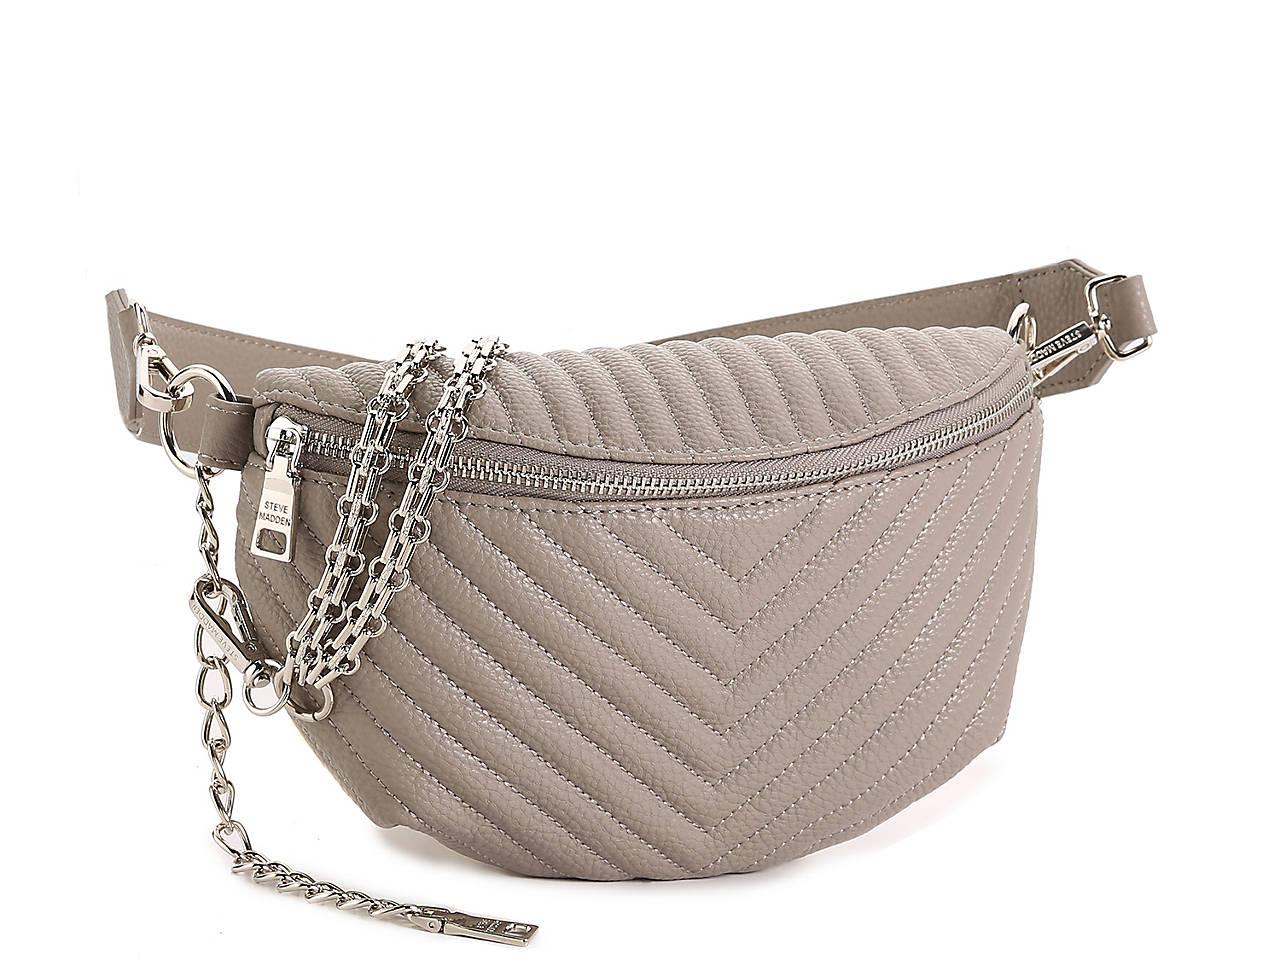 c89c8750db12 Steve Madden Bfanny Belt Bag Women s Handbags   Accessories